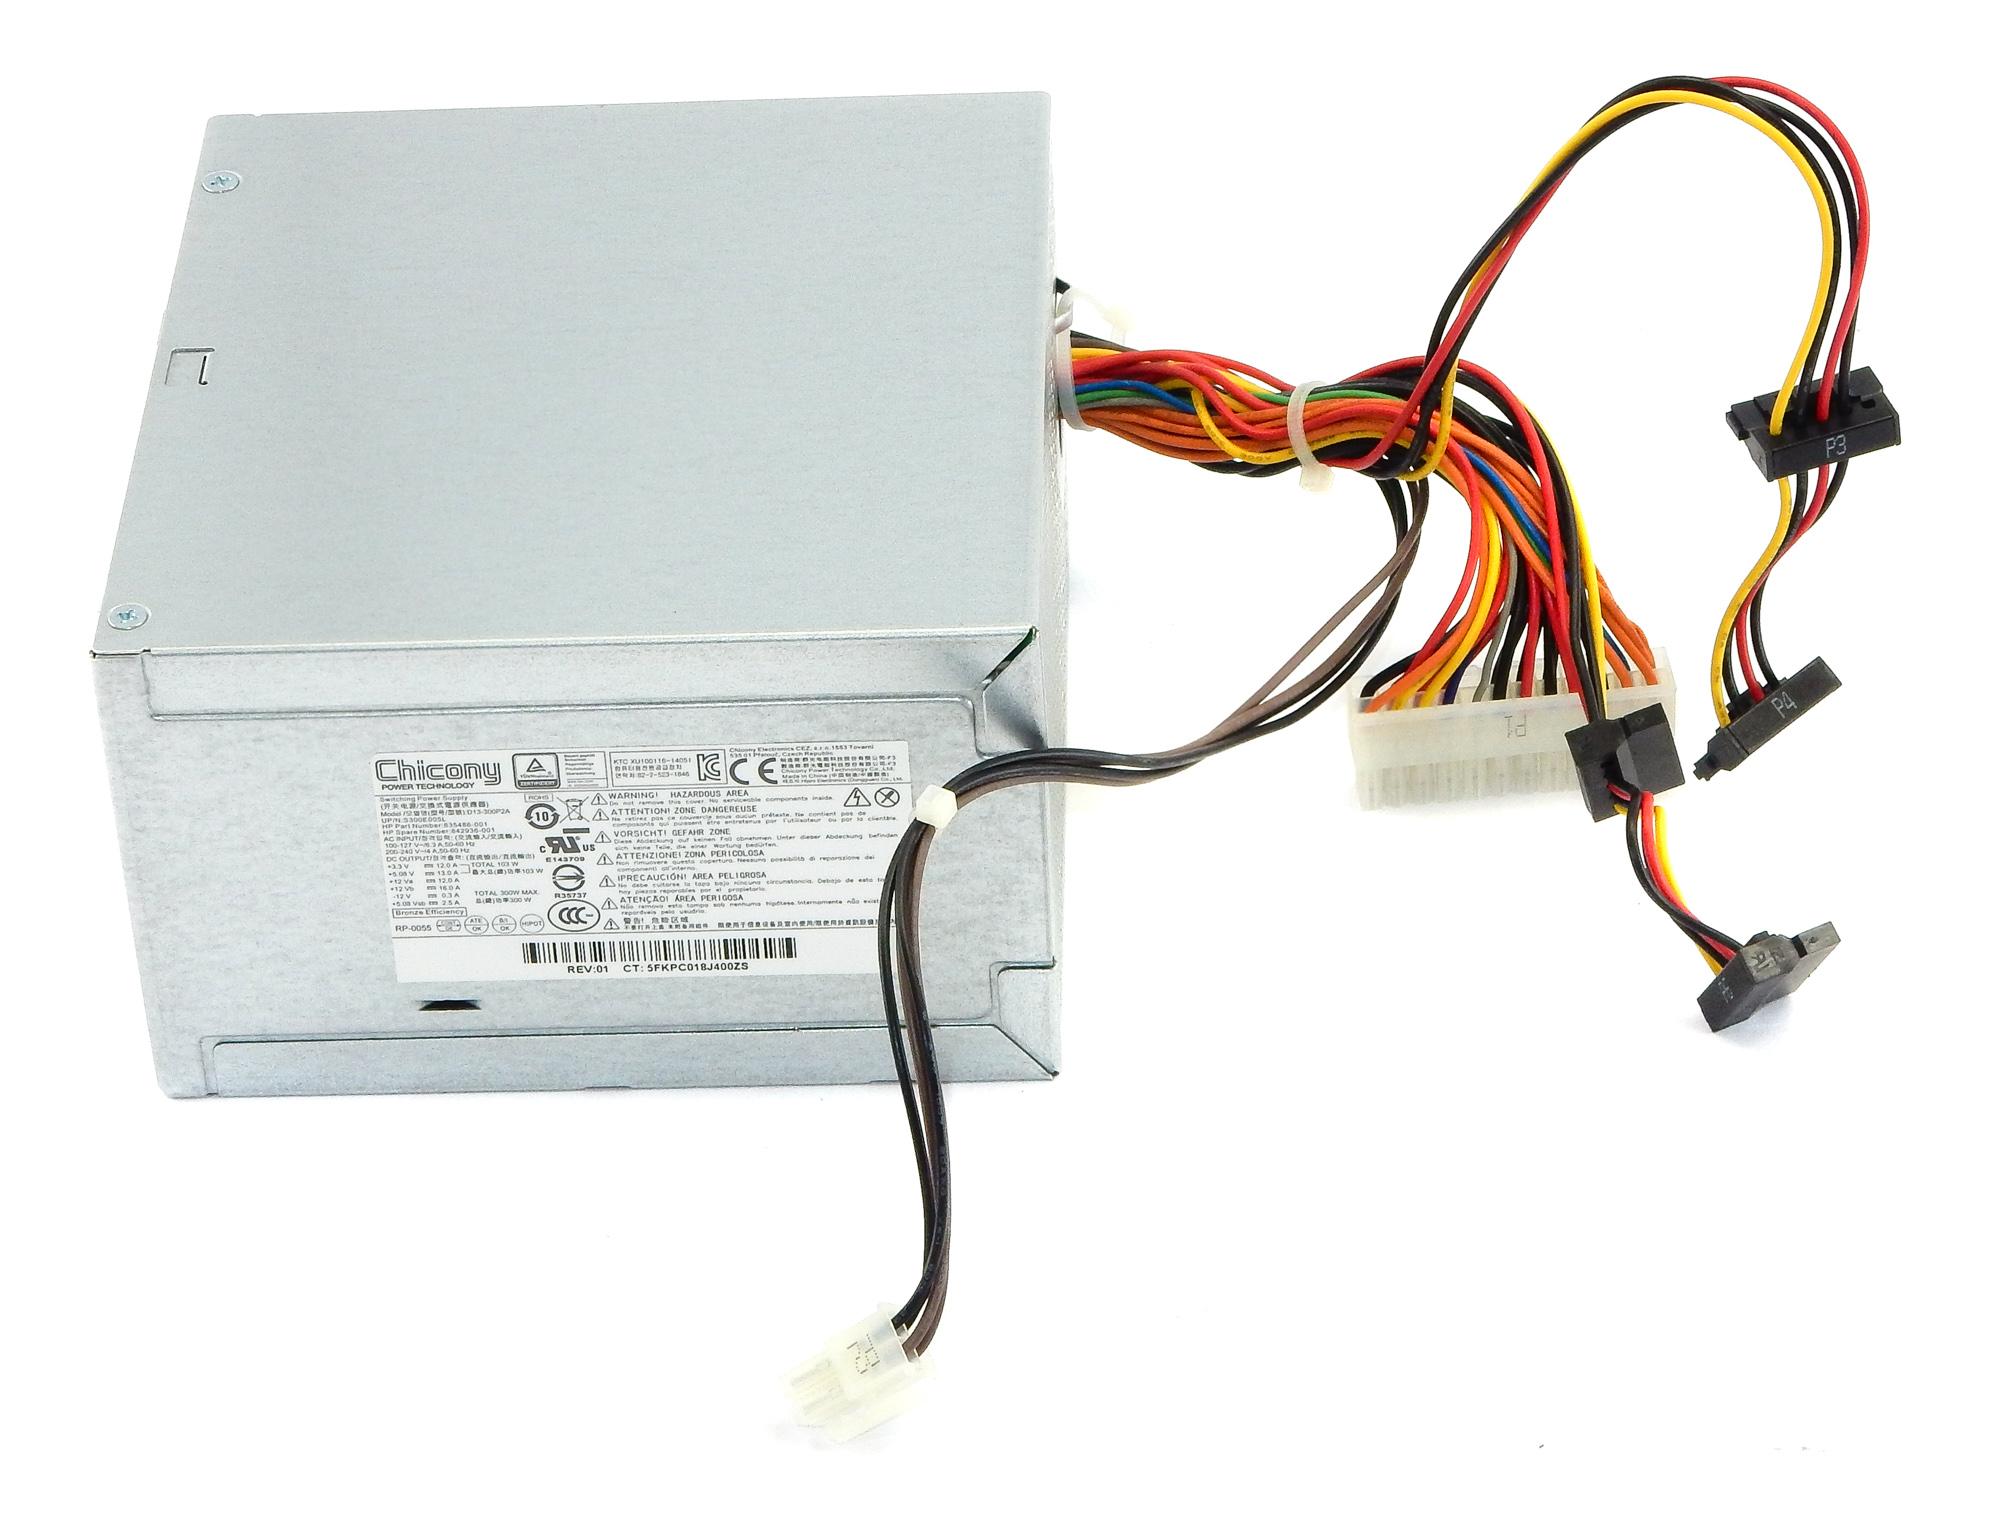 HP 842936-001 Chicony D13-300P2A 300W Server Power Supply f/ ML10 Gen9